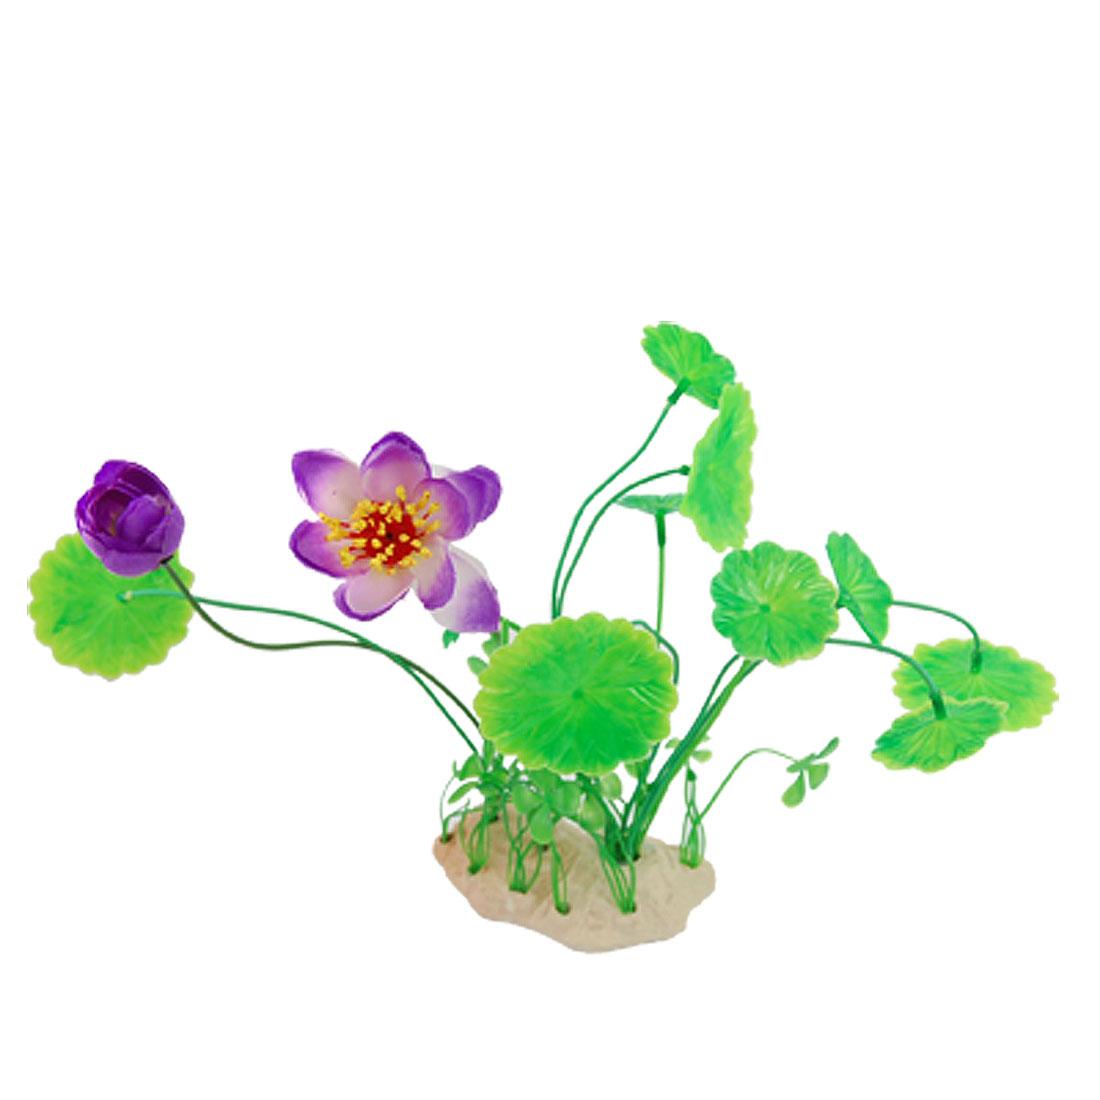 "9.4"" Height Emulational Plastic Lotus Underwater Plant Purple Green"